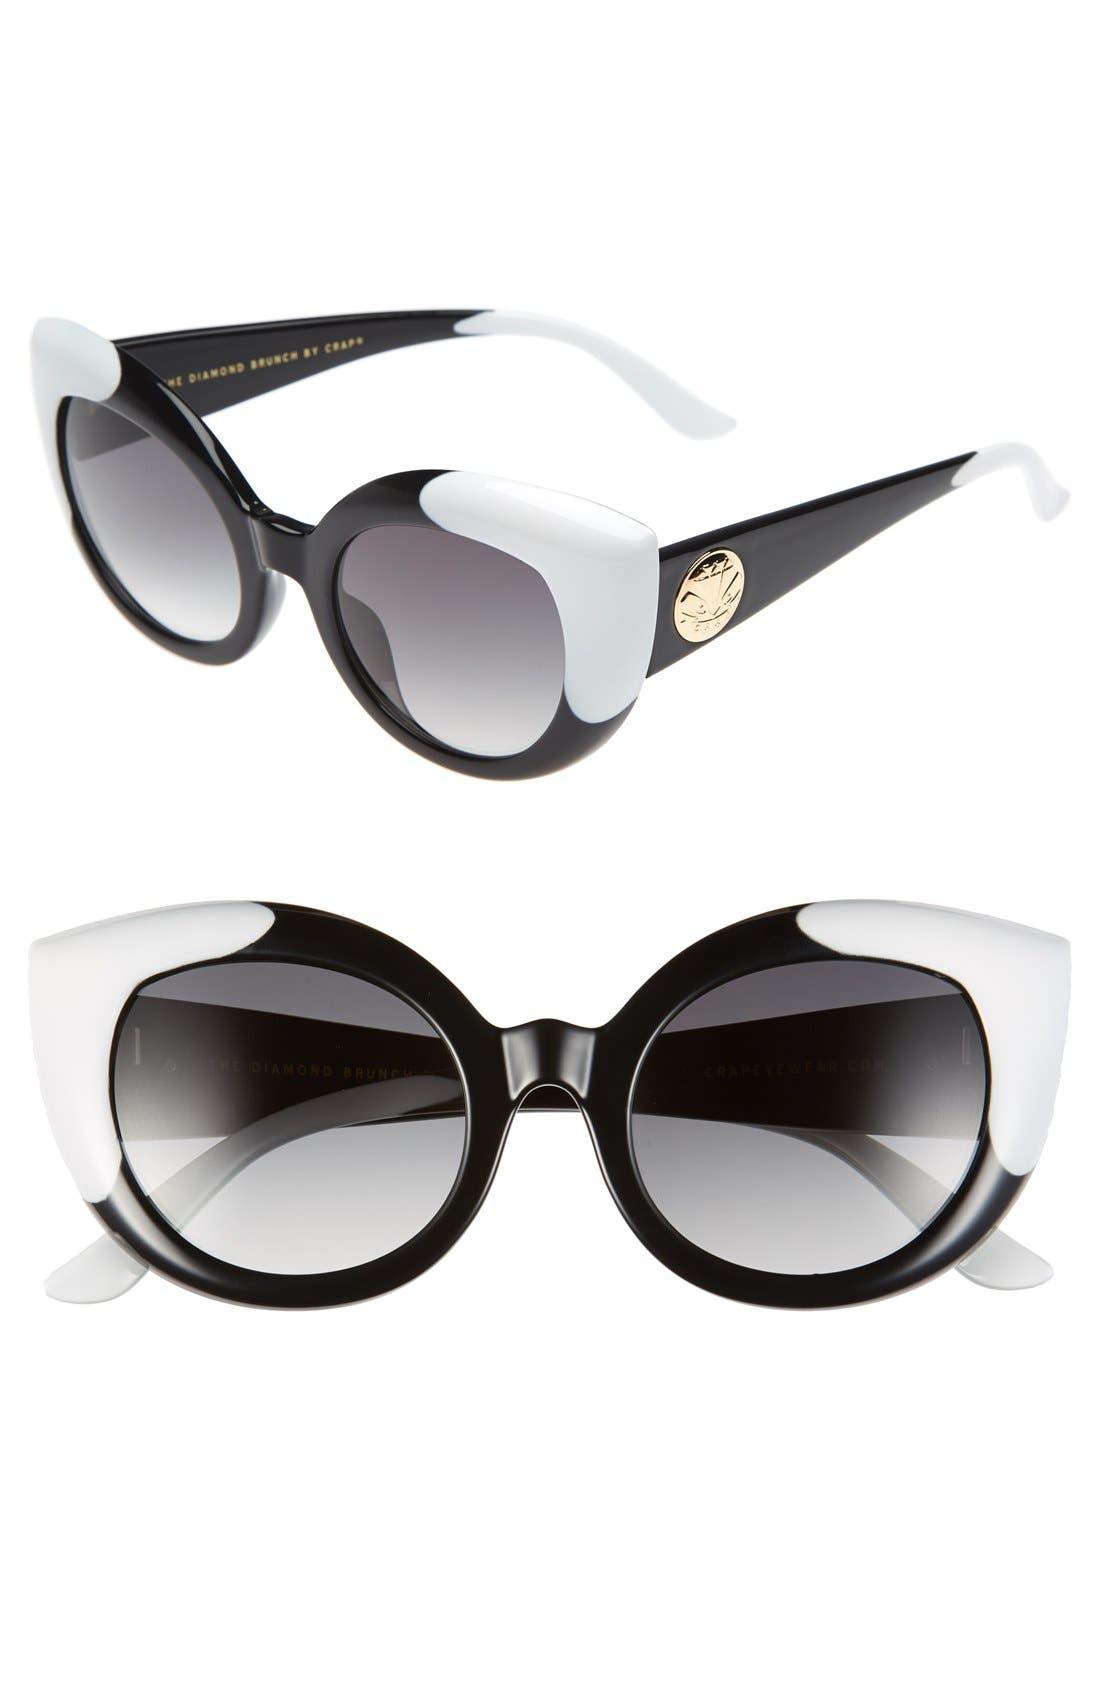 CRAP EYEWEAR, 'The Diamond Brunch' 55mm Sunglasses, Main thumbnail 1, color, 001